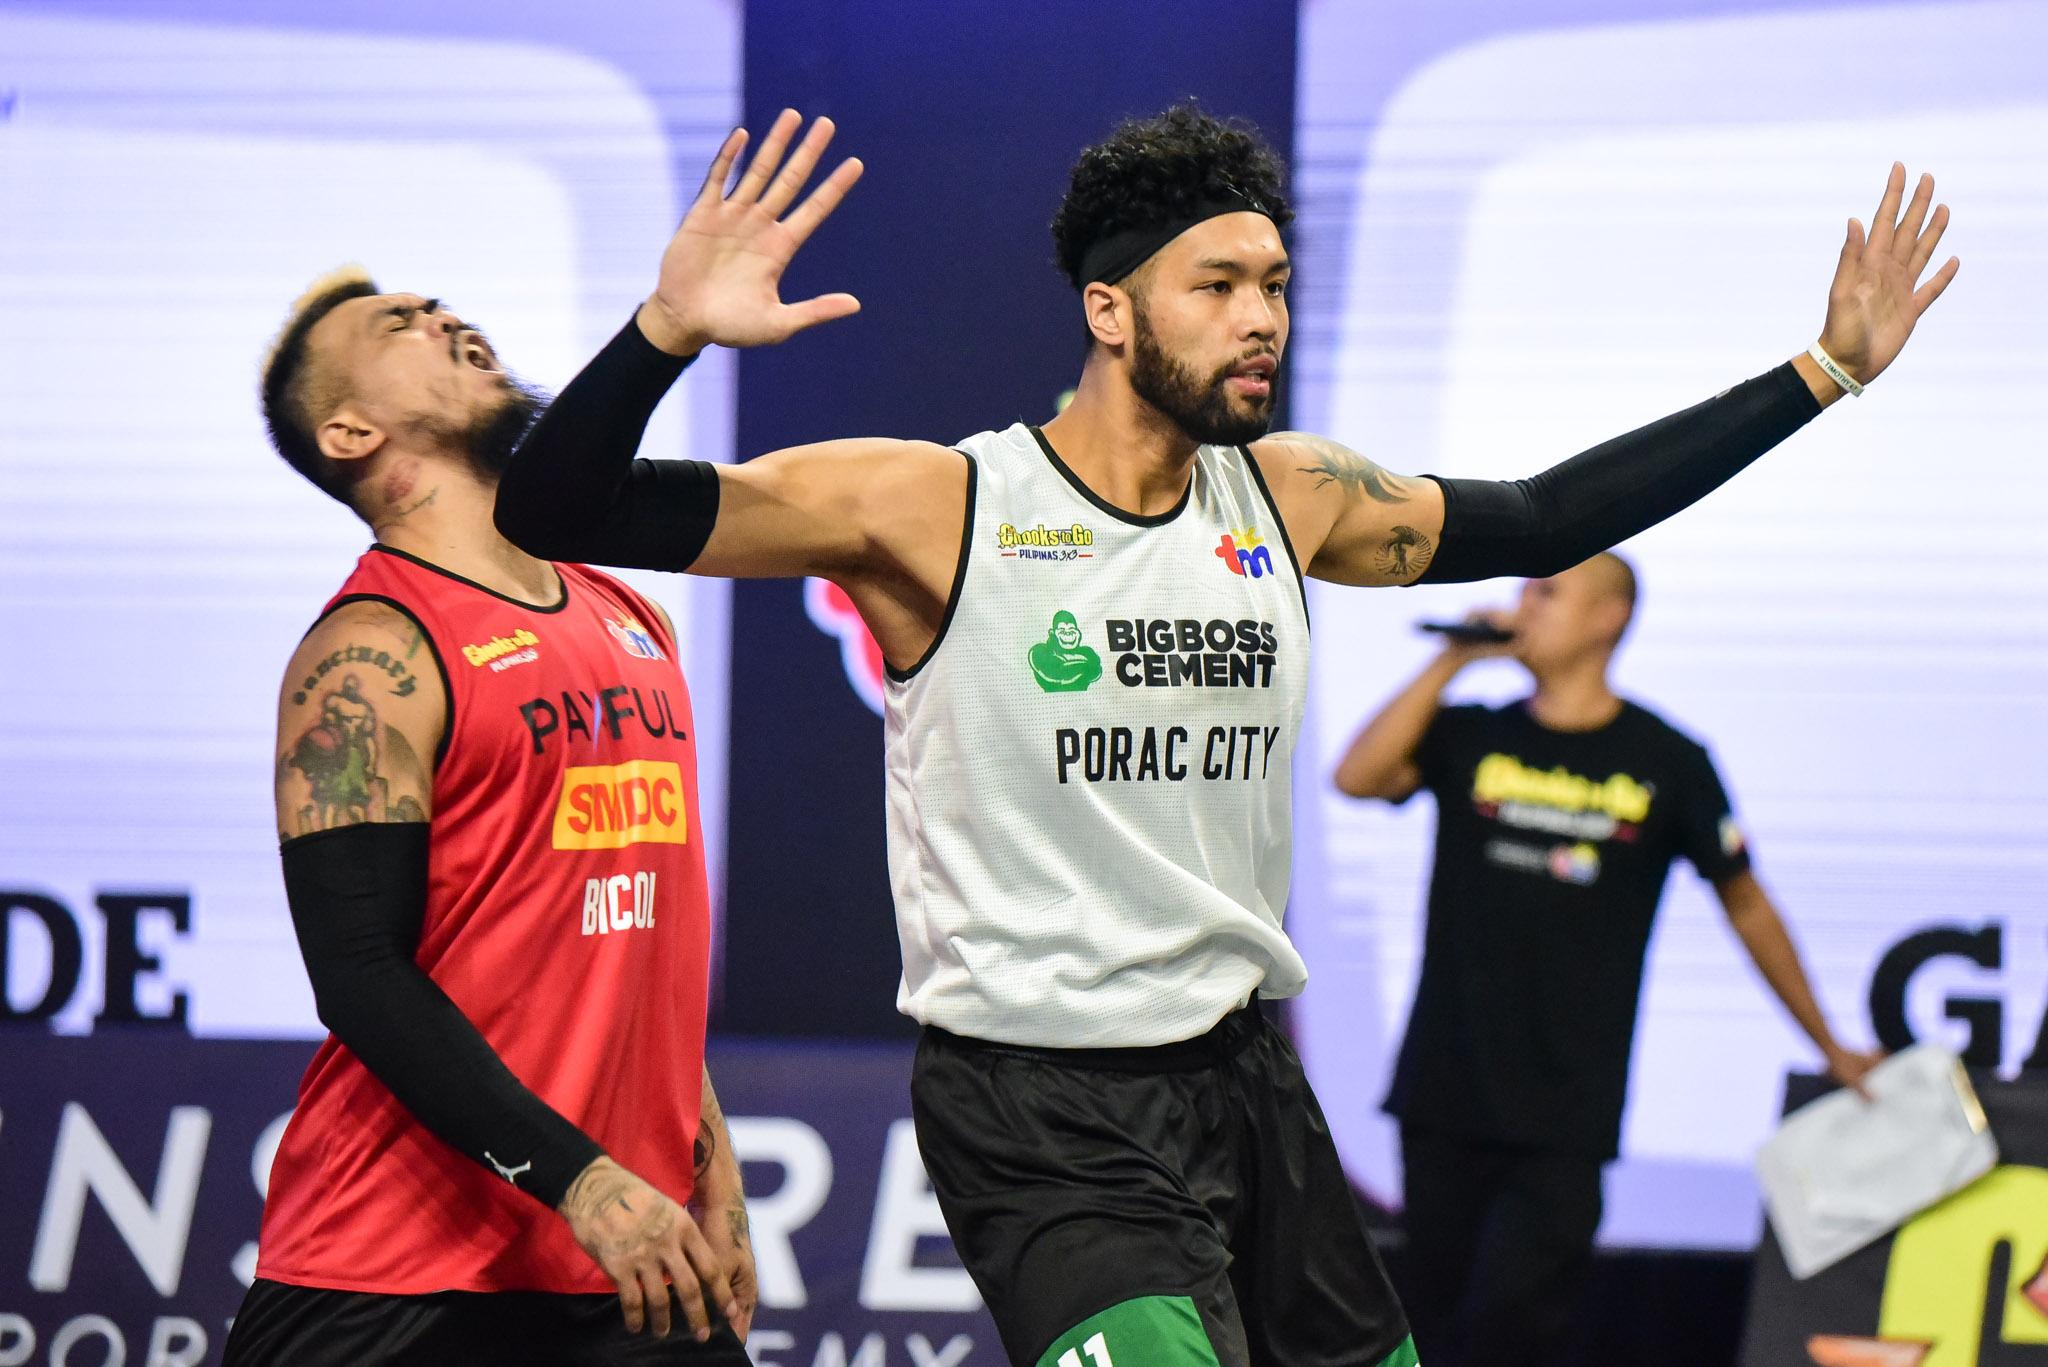 Chooks-to-Go-Pilipinas-3X3-Leg-1-Bicol-vs-Porac-Laput Big Boss Cement-Porac still adjusting to loaded team, 'soft calls' in Chooks 3x3 3x3 Basketball Chooks-to-Go Pilipinas 3x3 News  - philippine sports news